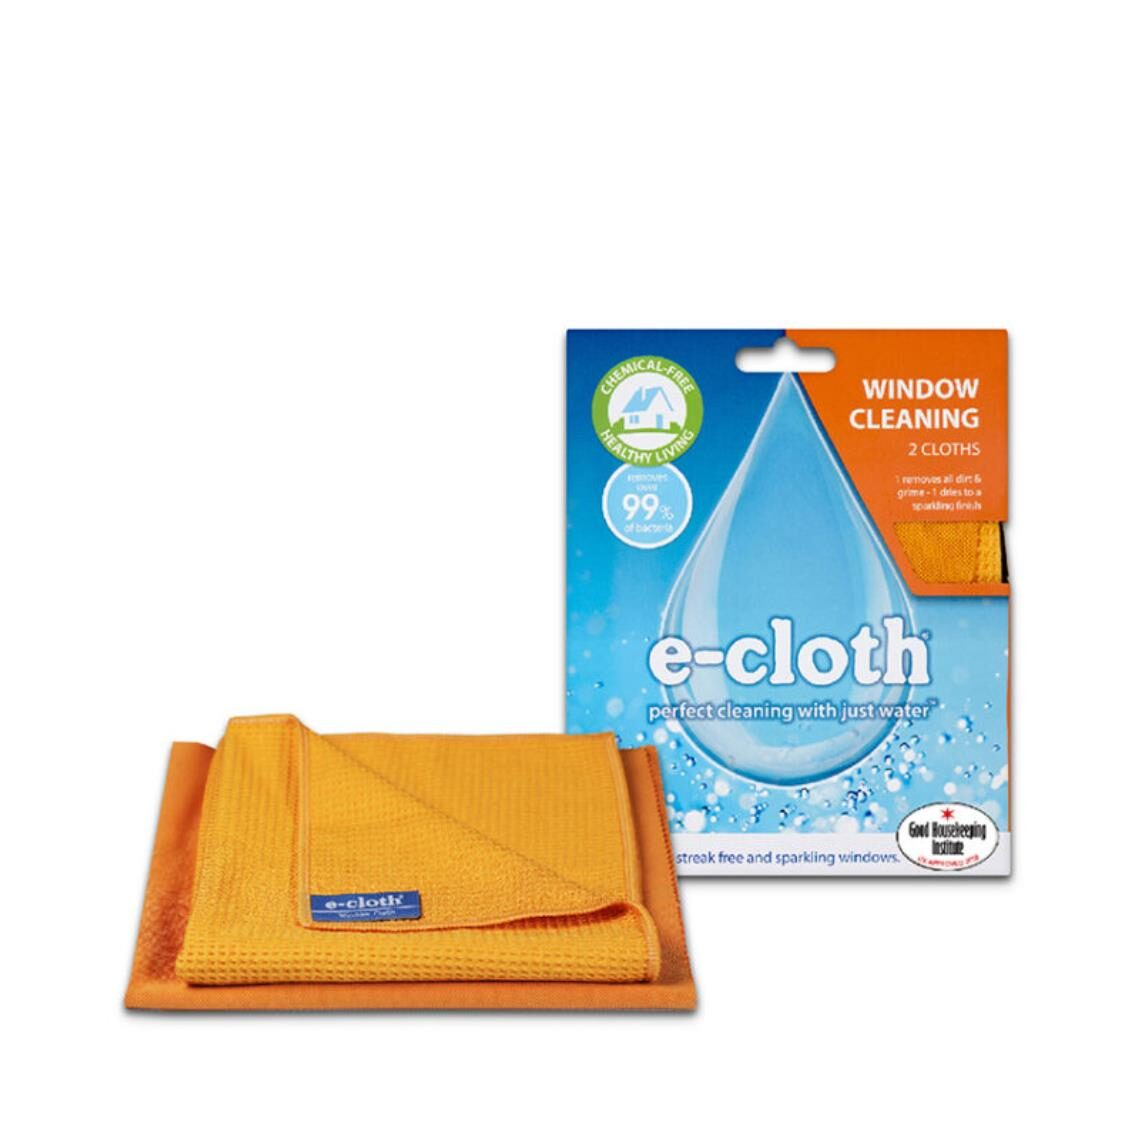 E-Cloth Window Cleaing Cloth EC20150